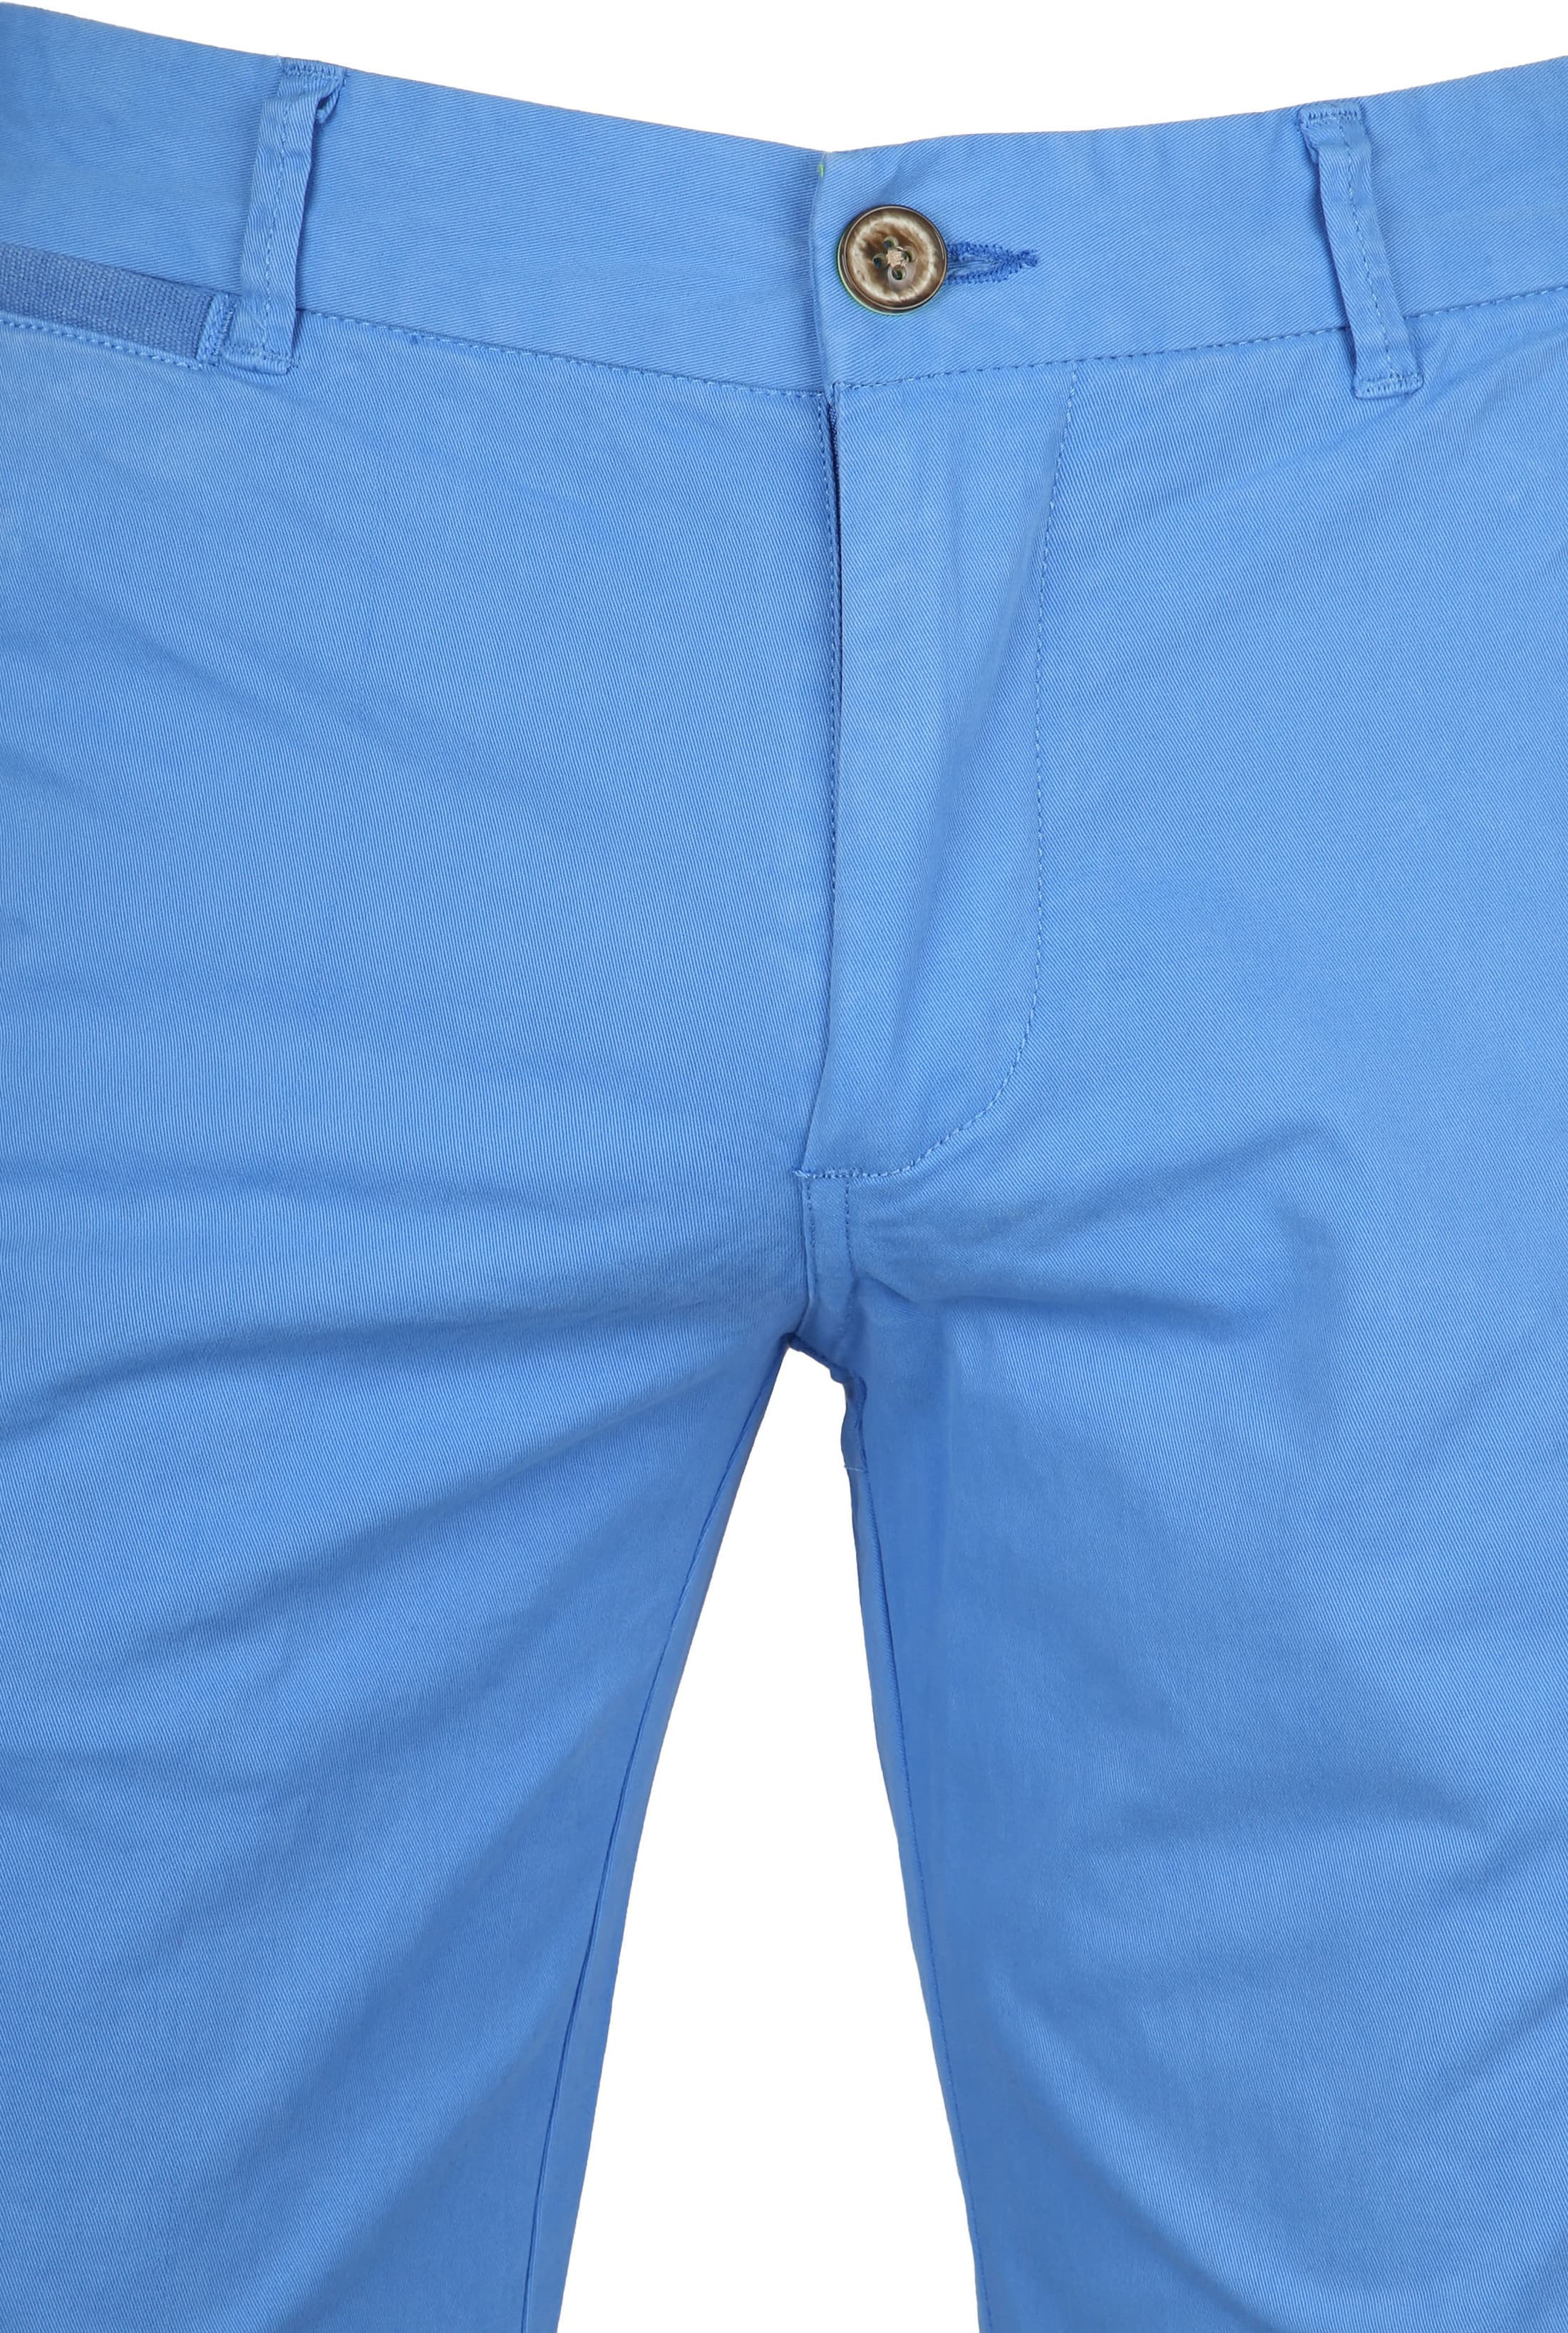 Suitable Short Arend Blauw foto 2